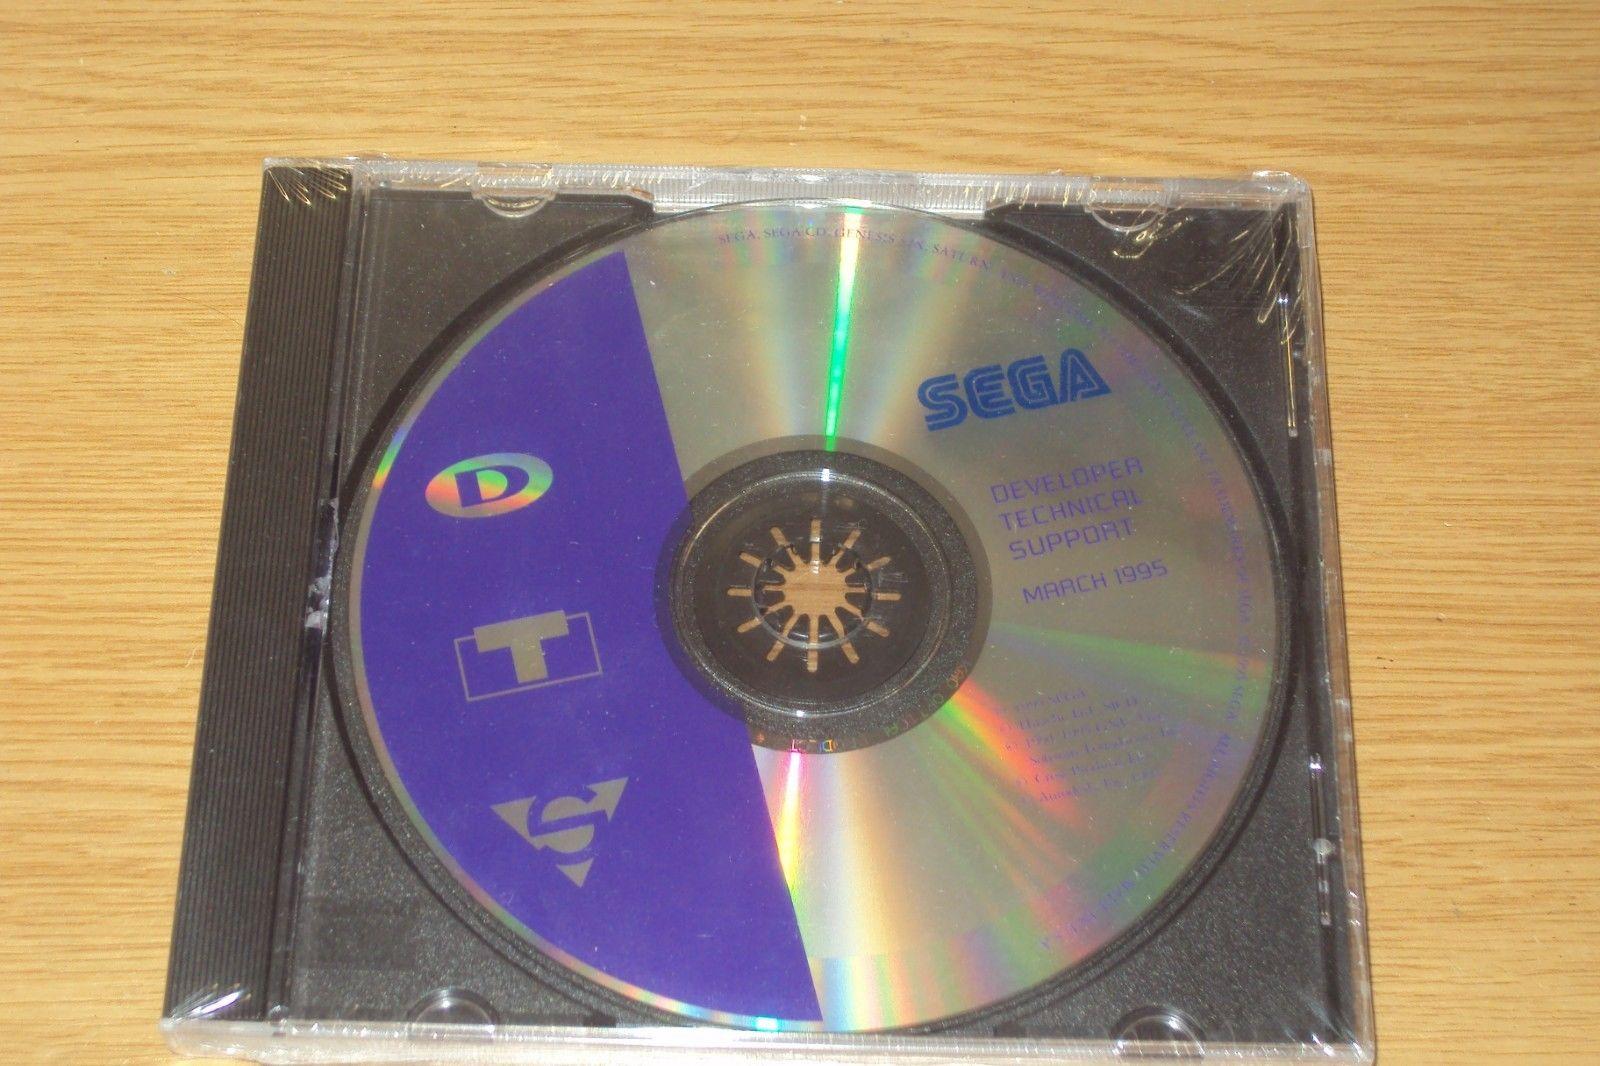 Console/SegaSaturn/Pictures/DTSCDs.jpg